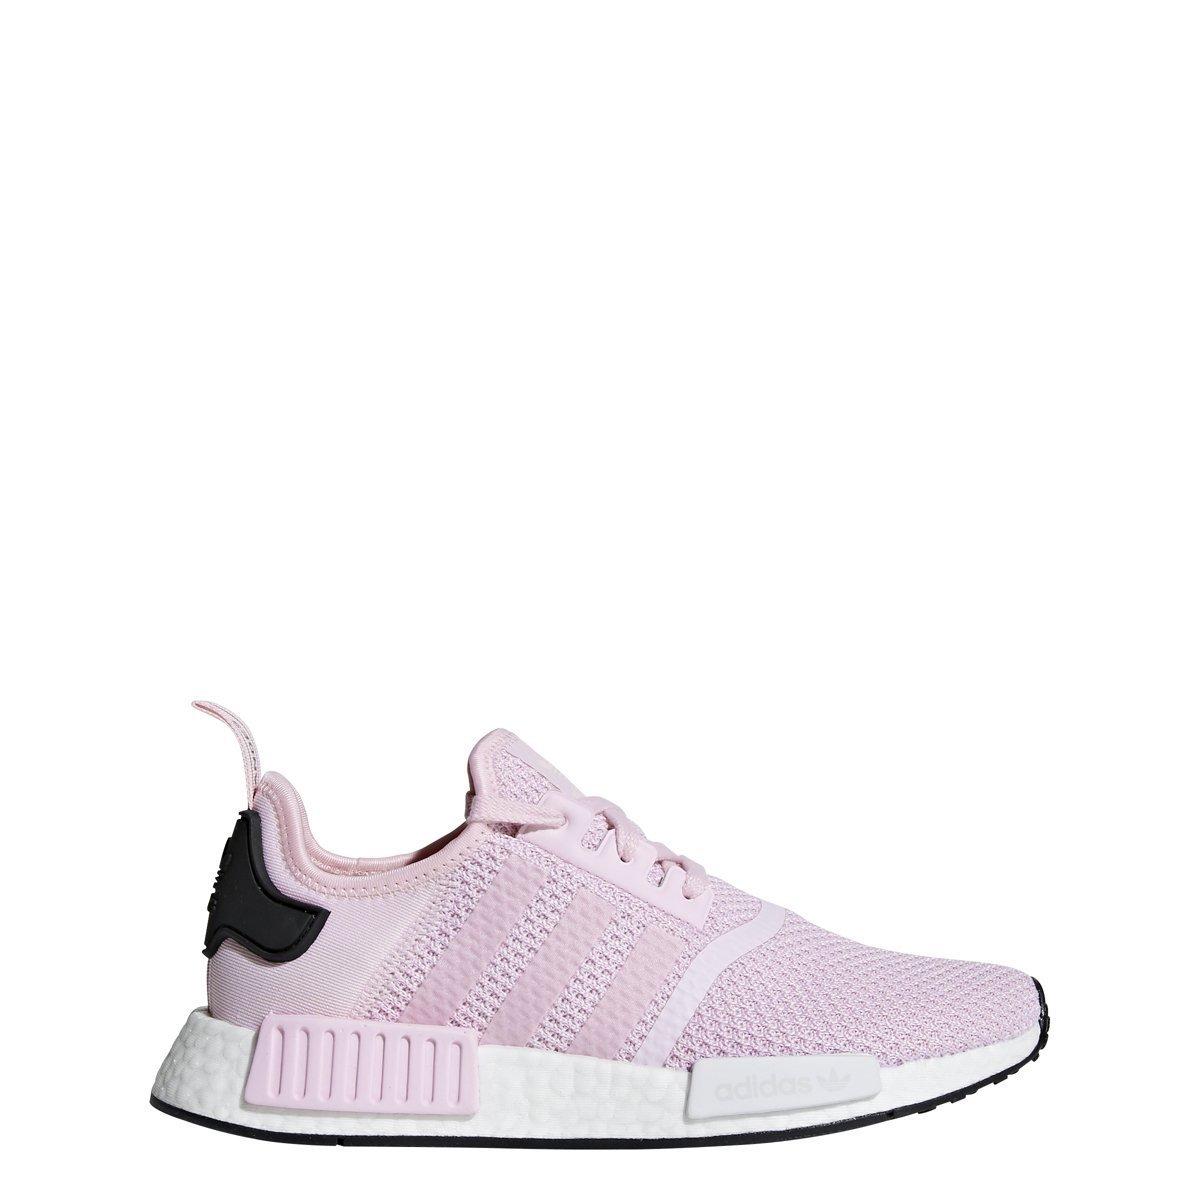 24da76f4a Galleon - Adidas Originals NMD R1 Shoe Women s Casual 6.5 Clear  Pink-White-Black